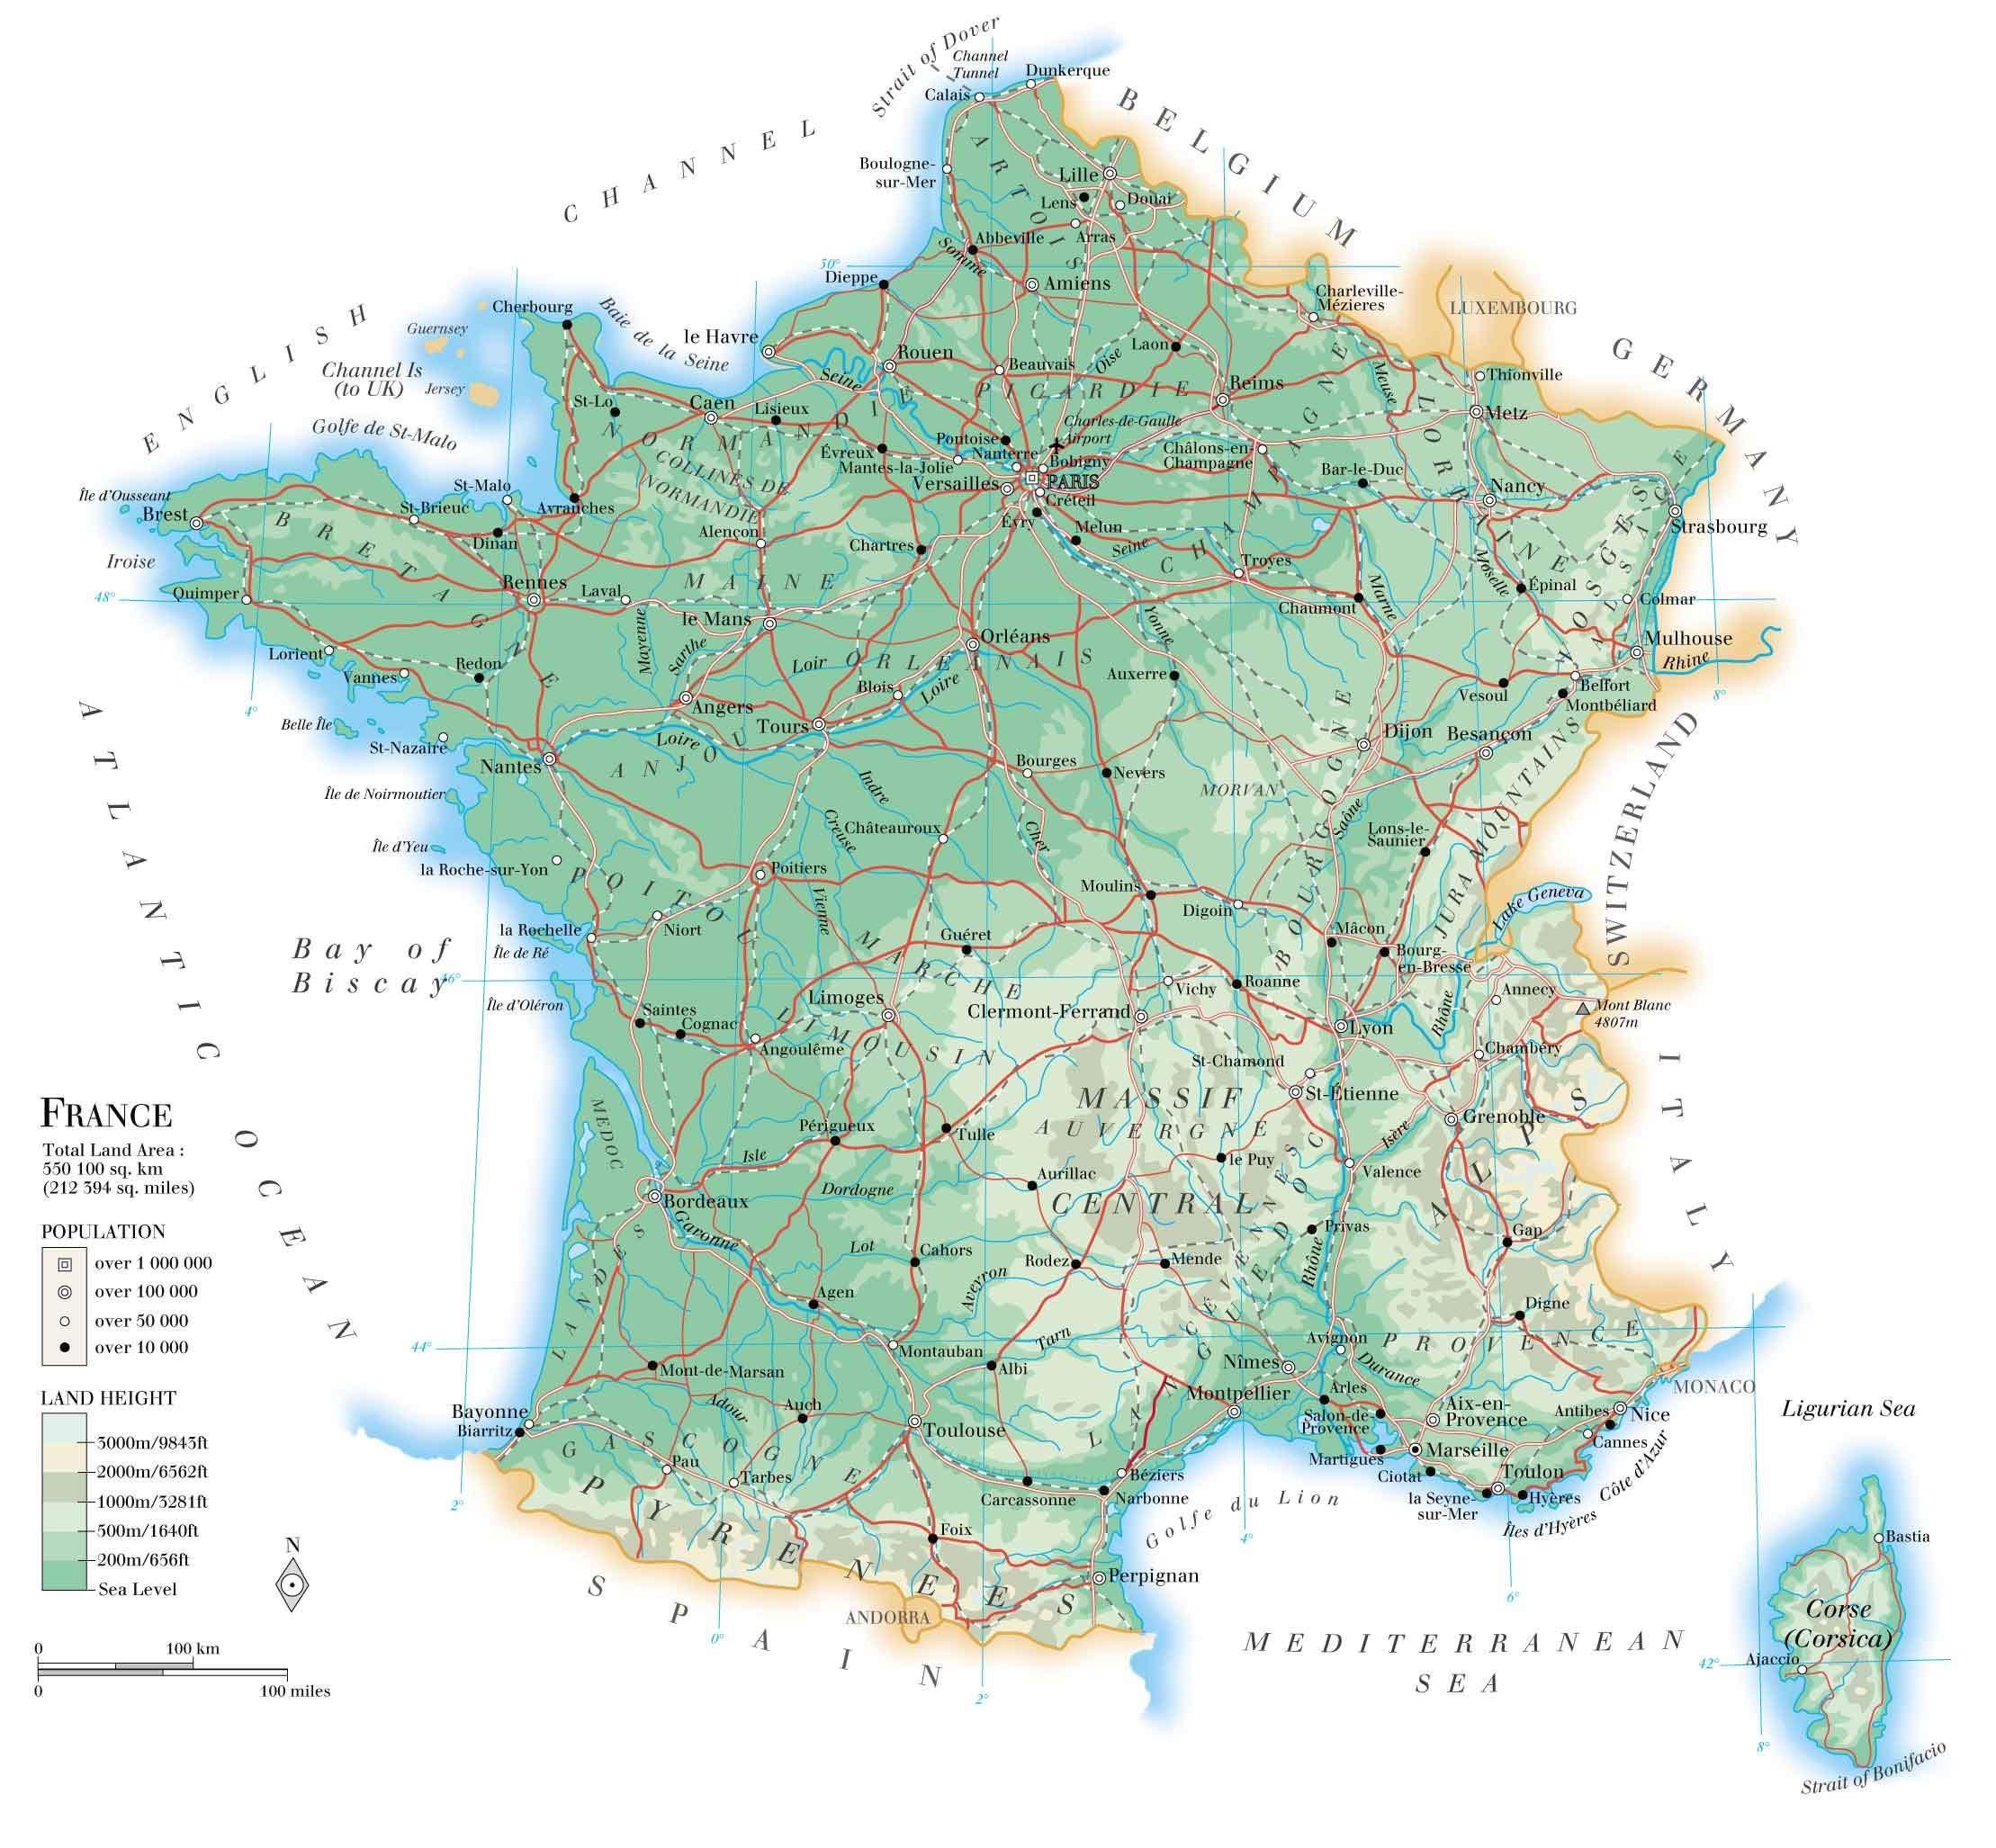 grande-carte-de-france - Photo